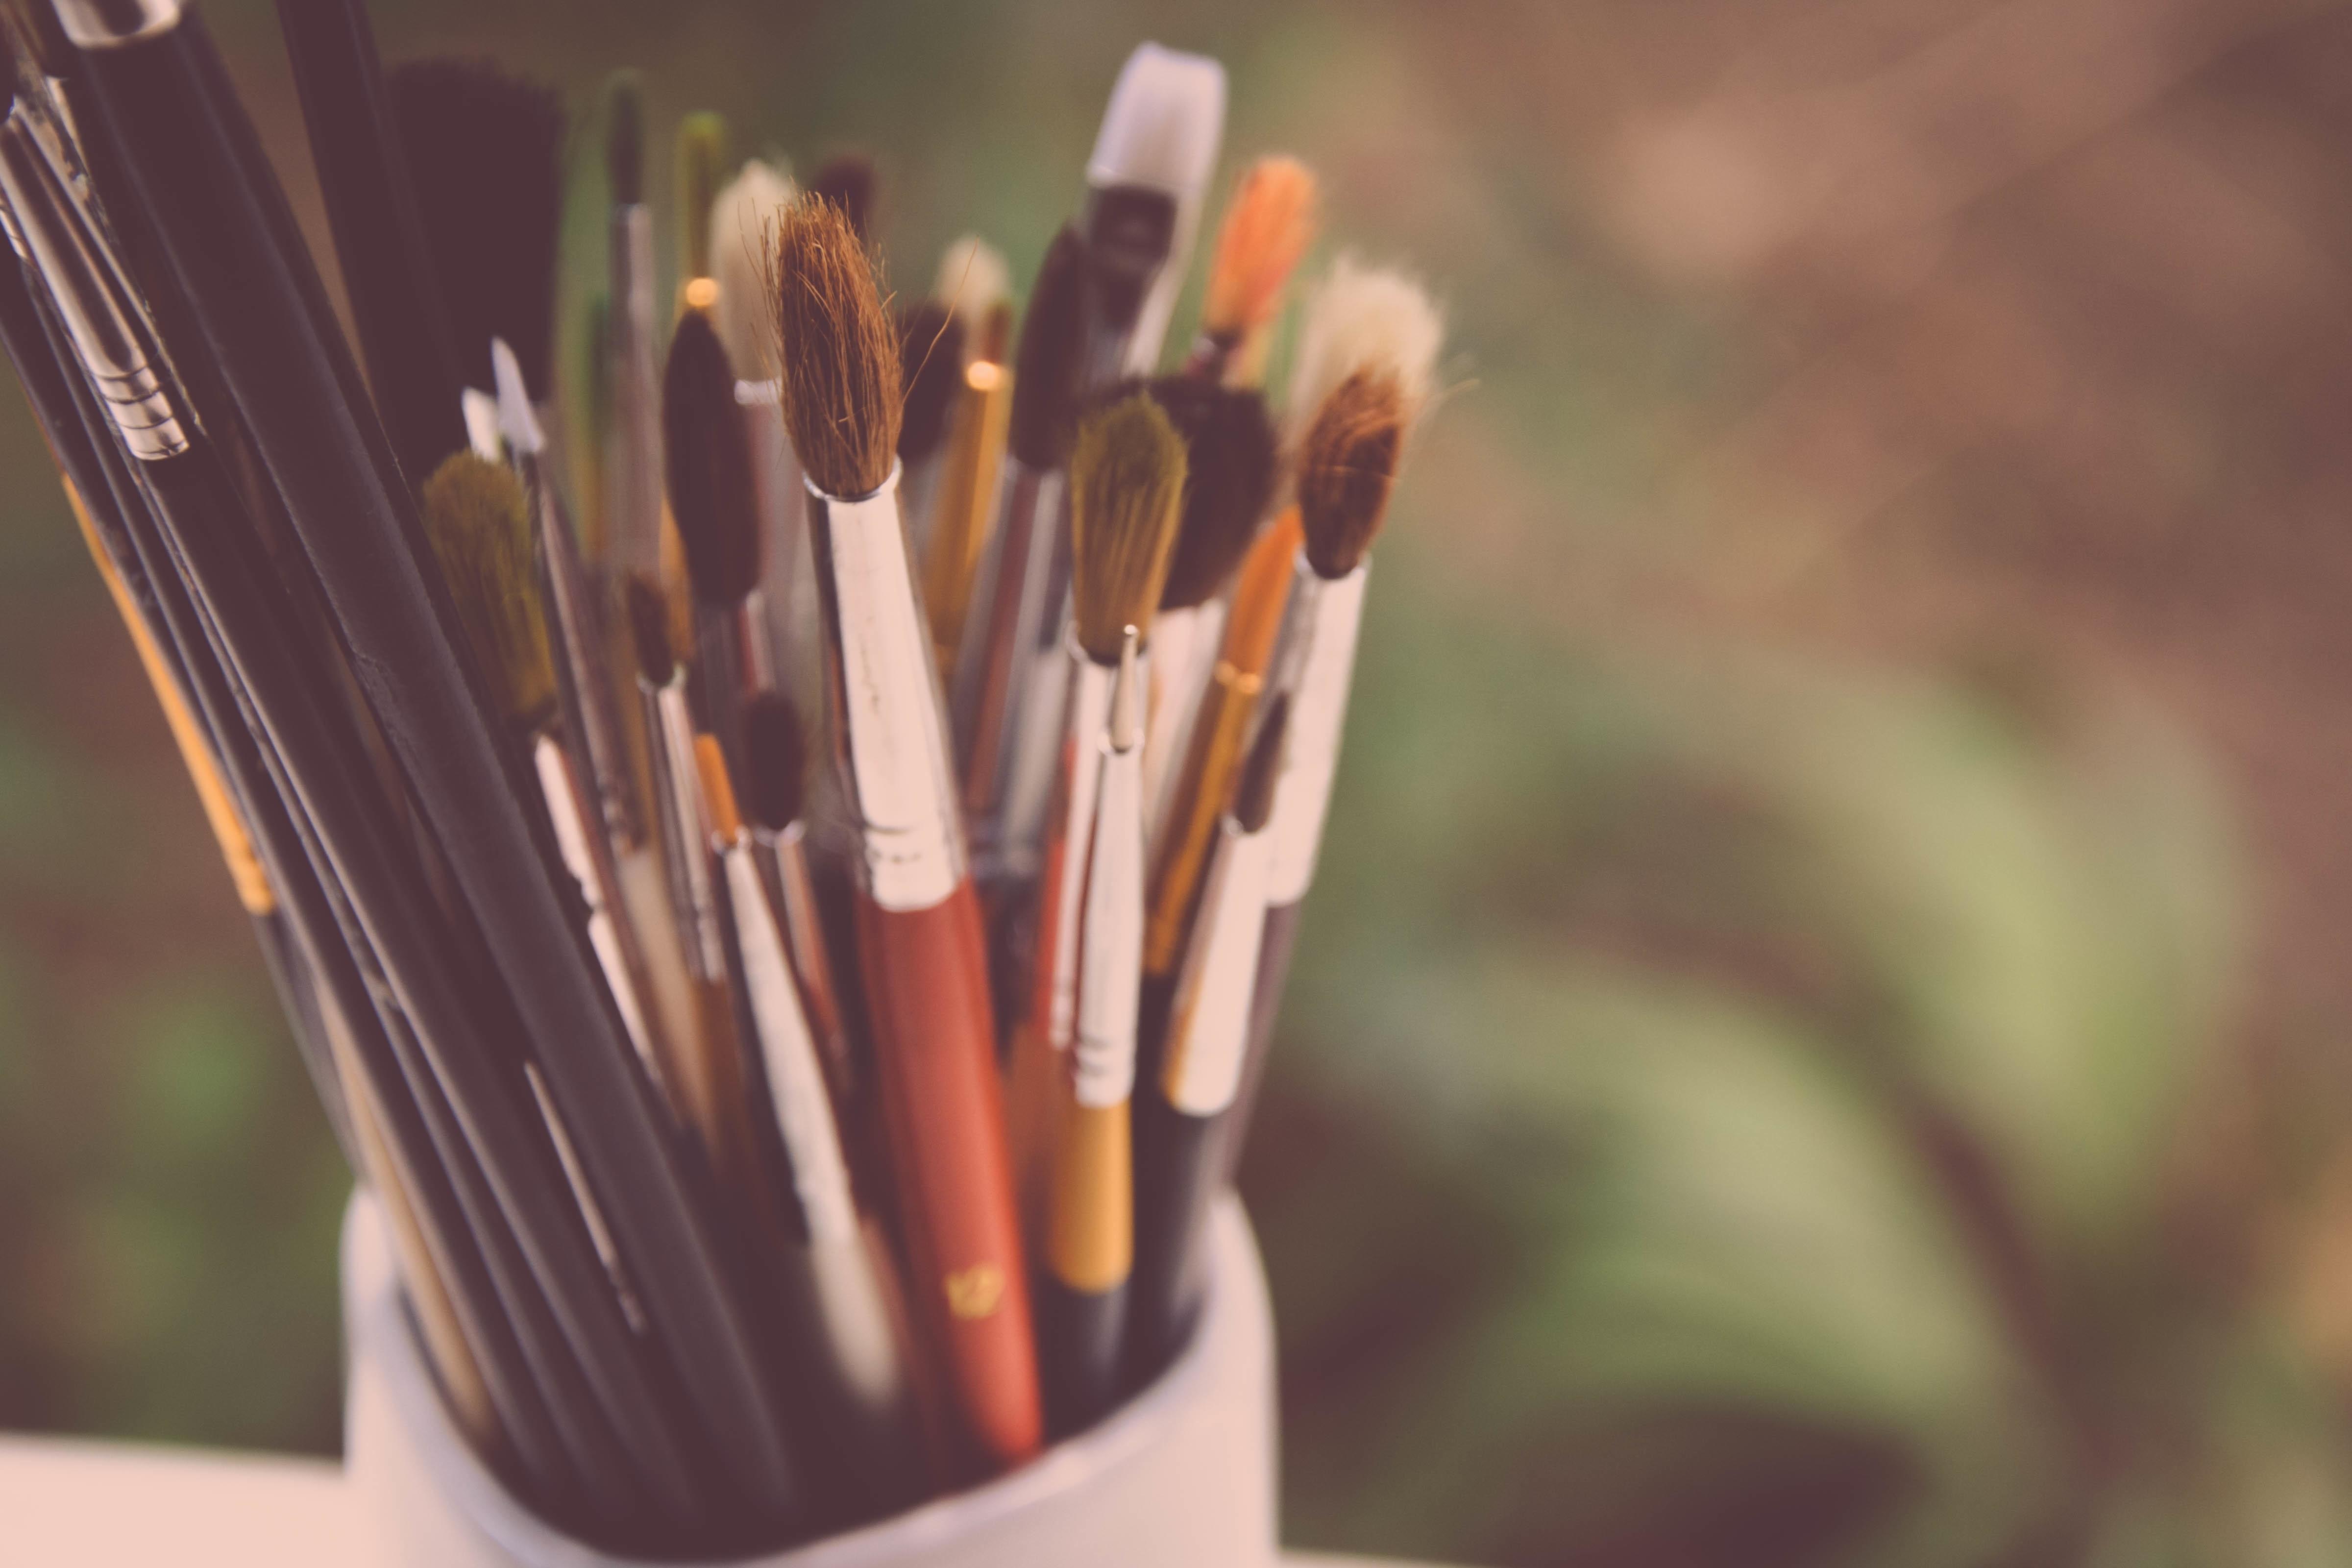 Free Images : flower, color, artistic, artist, paintbrush ...